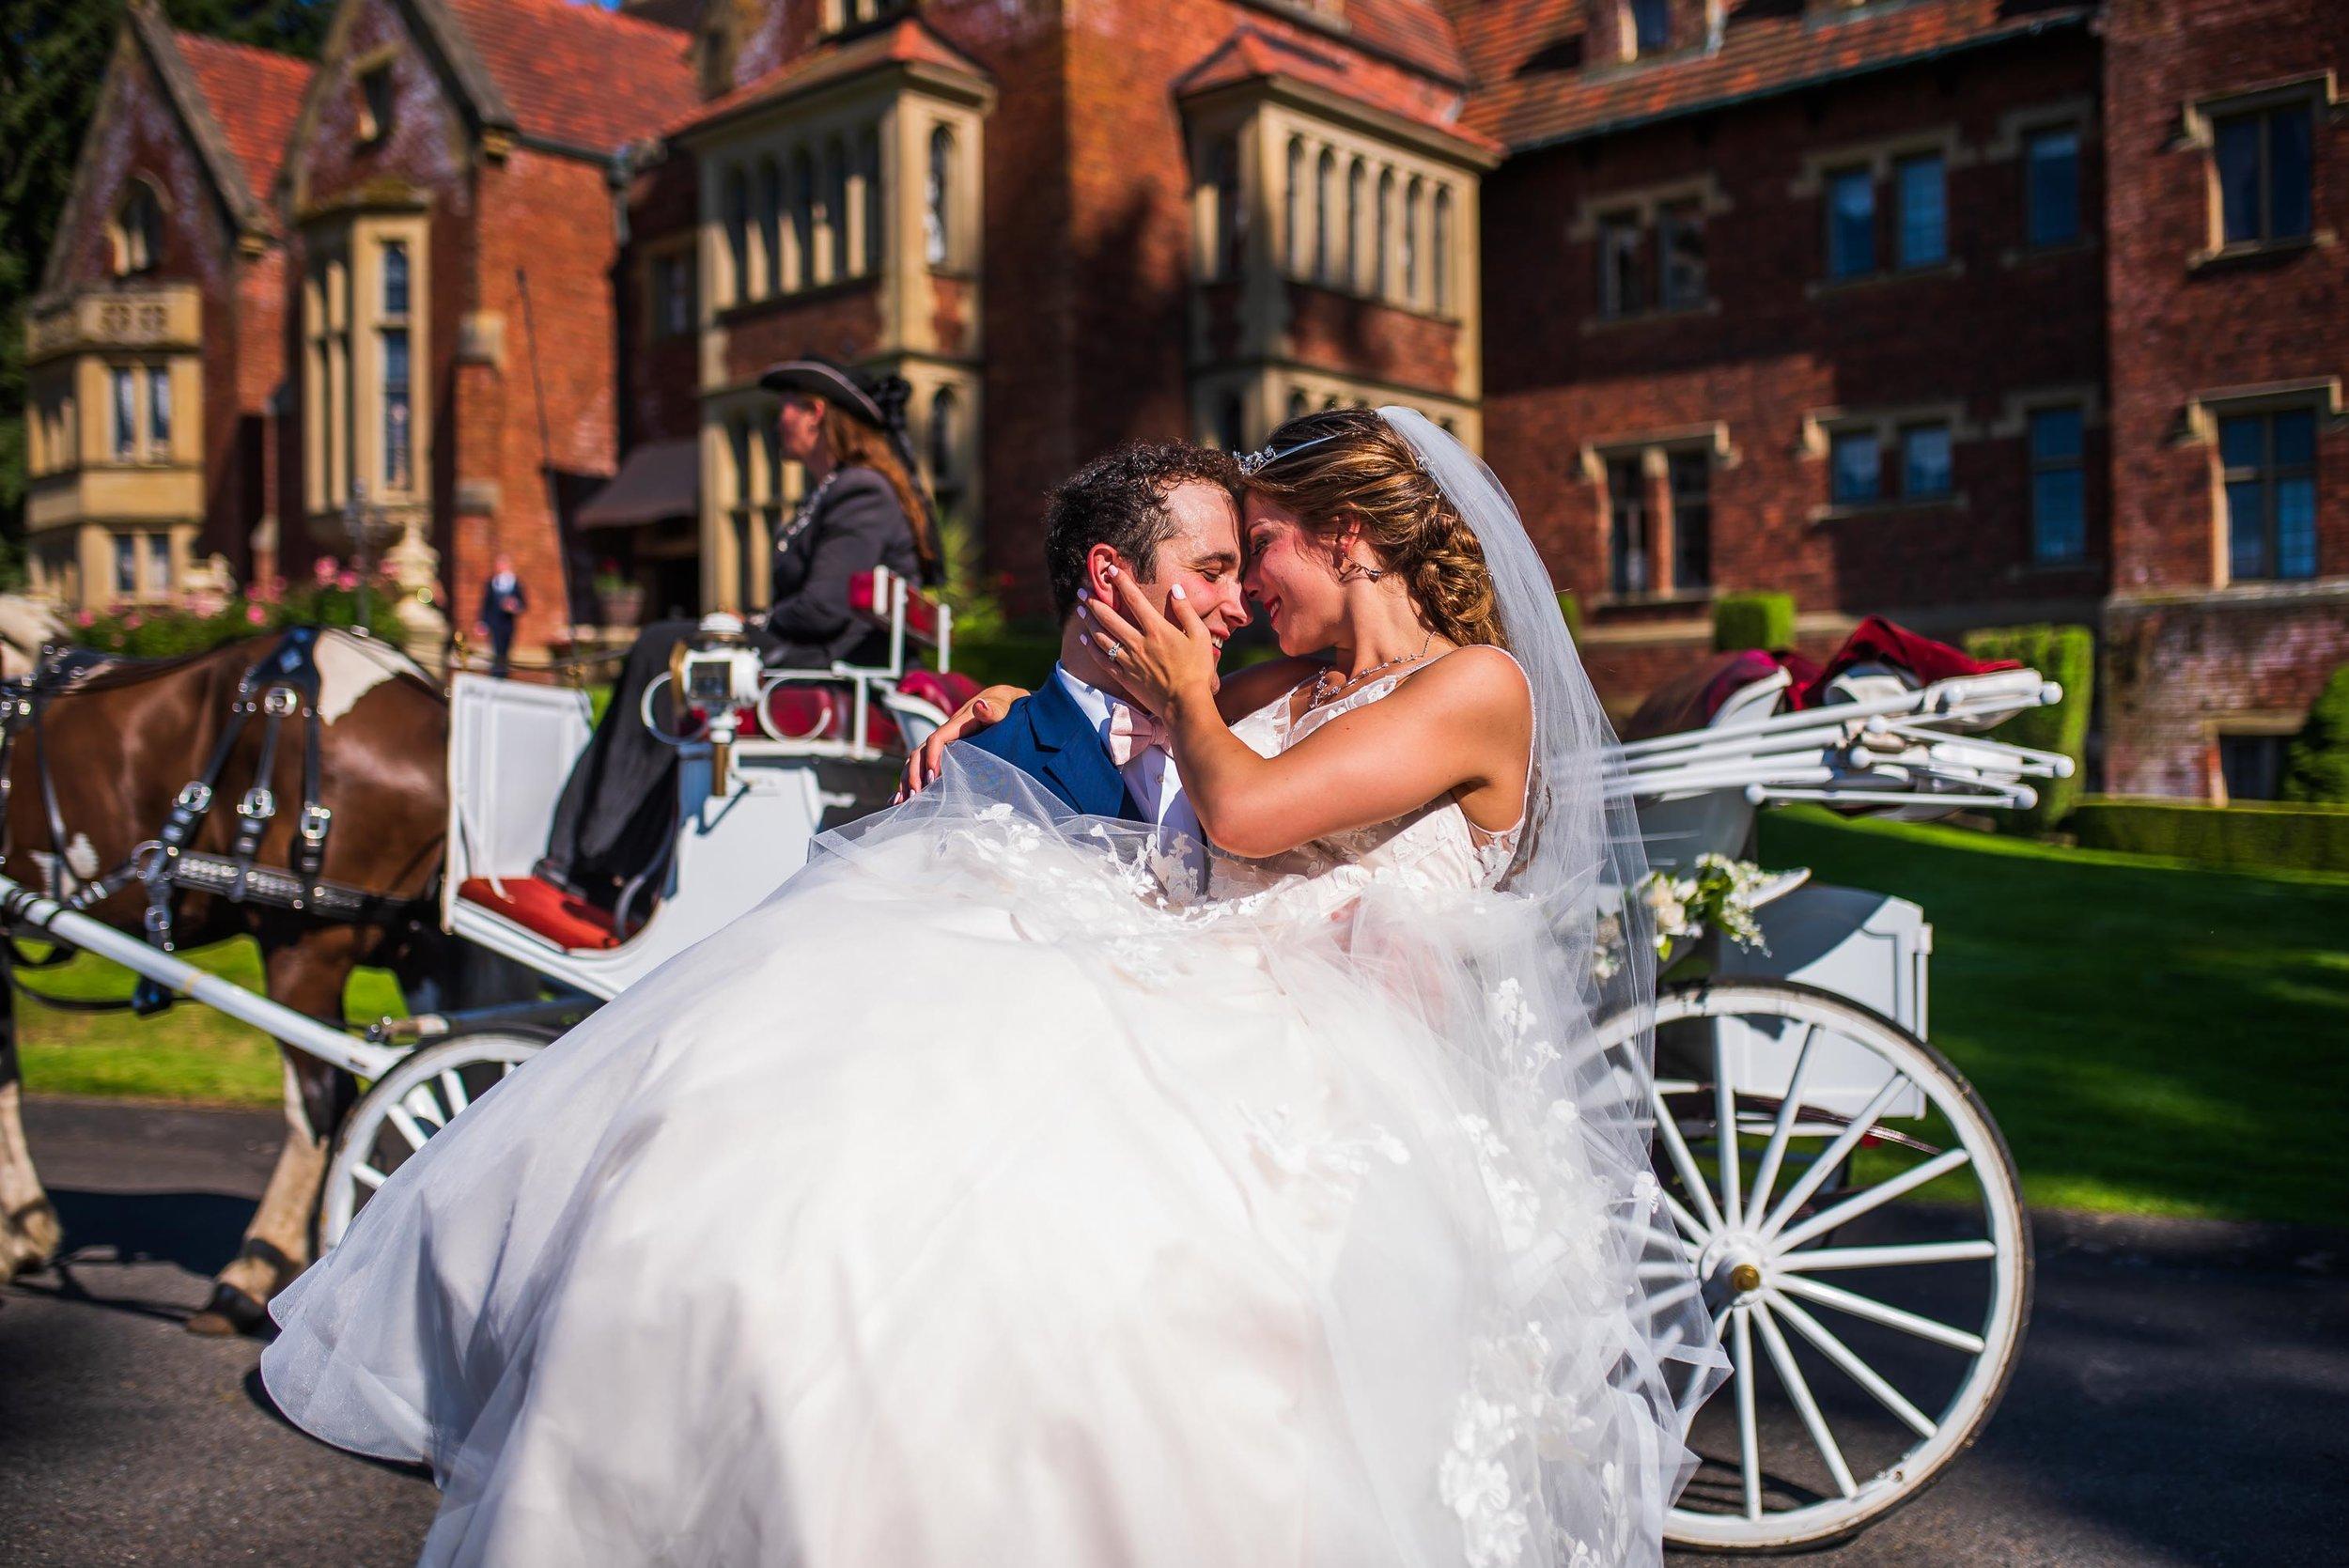 thornewood castle wedding 54.jpg